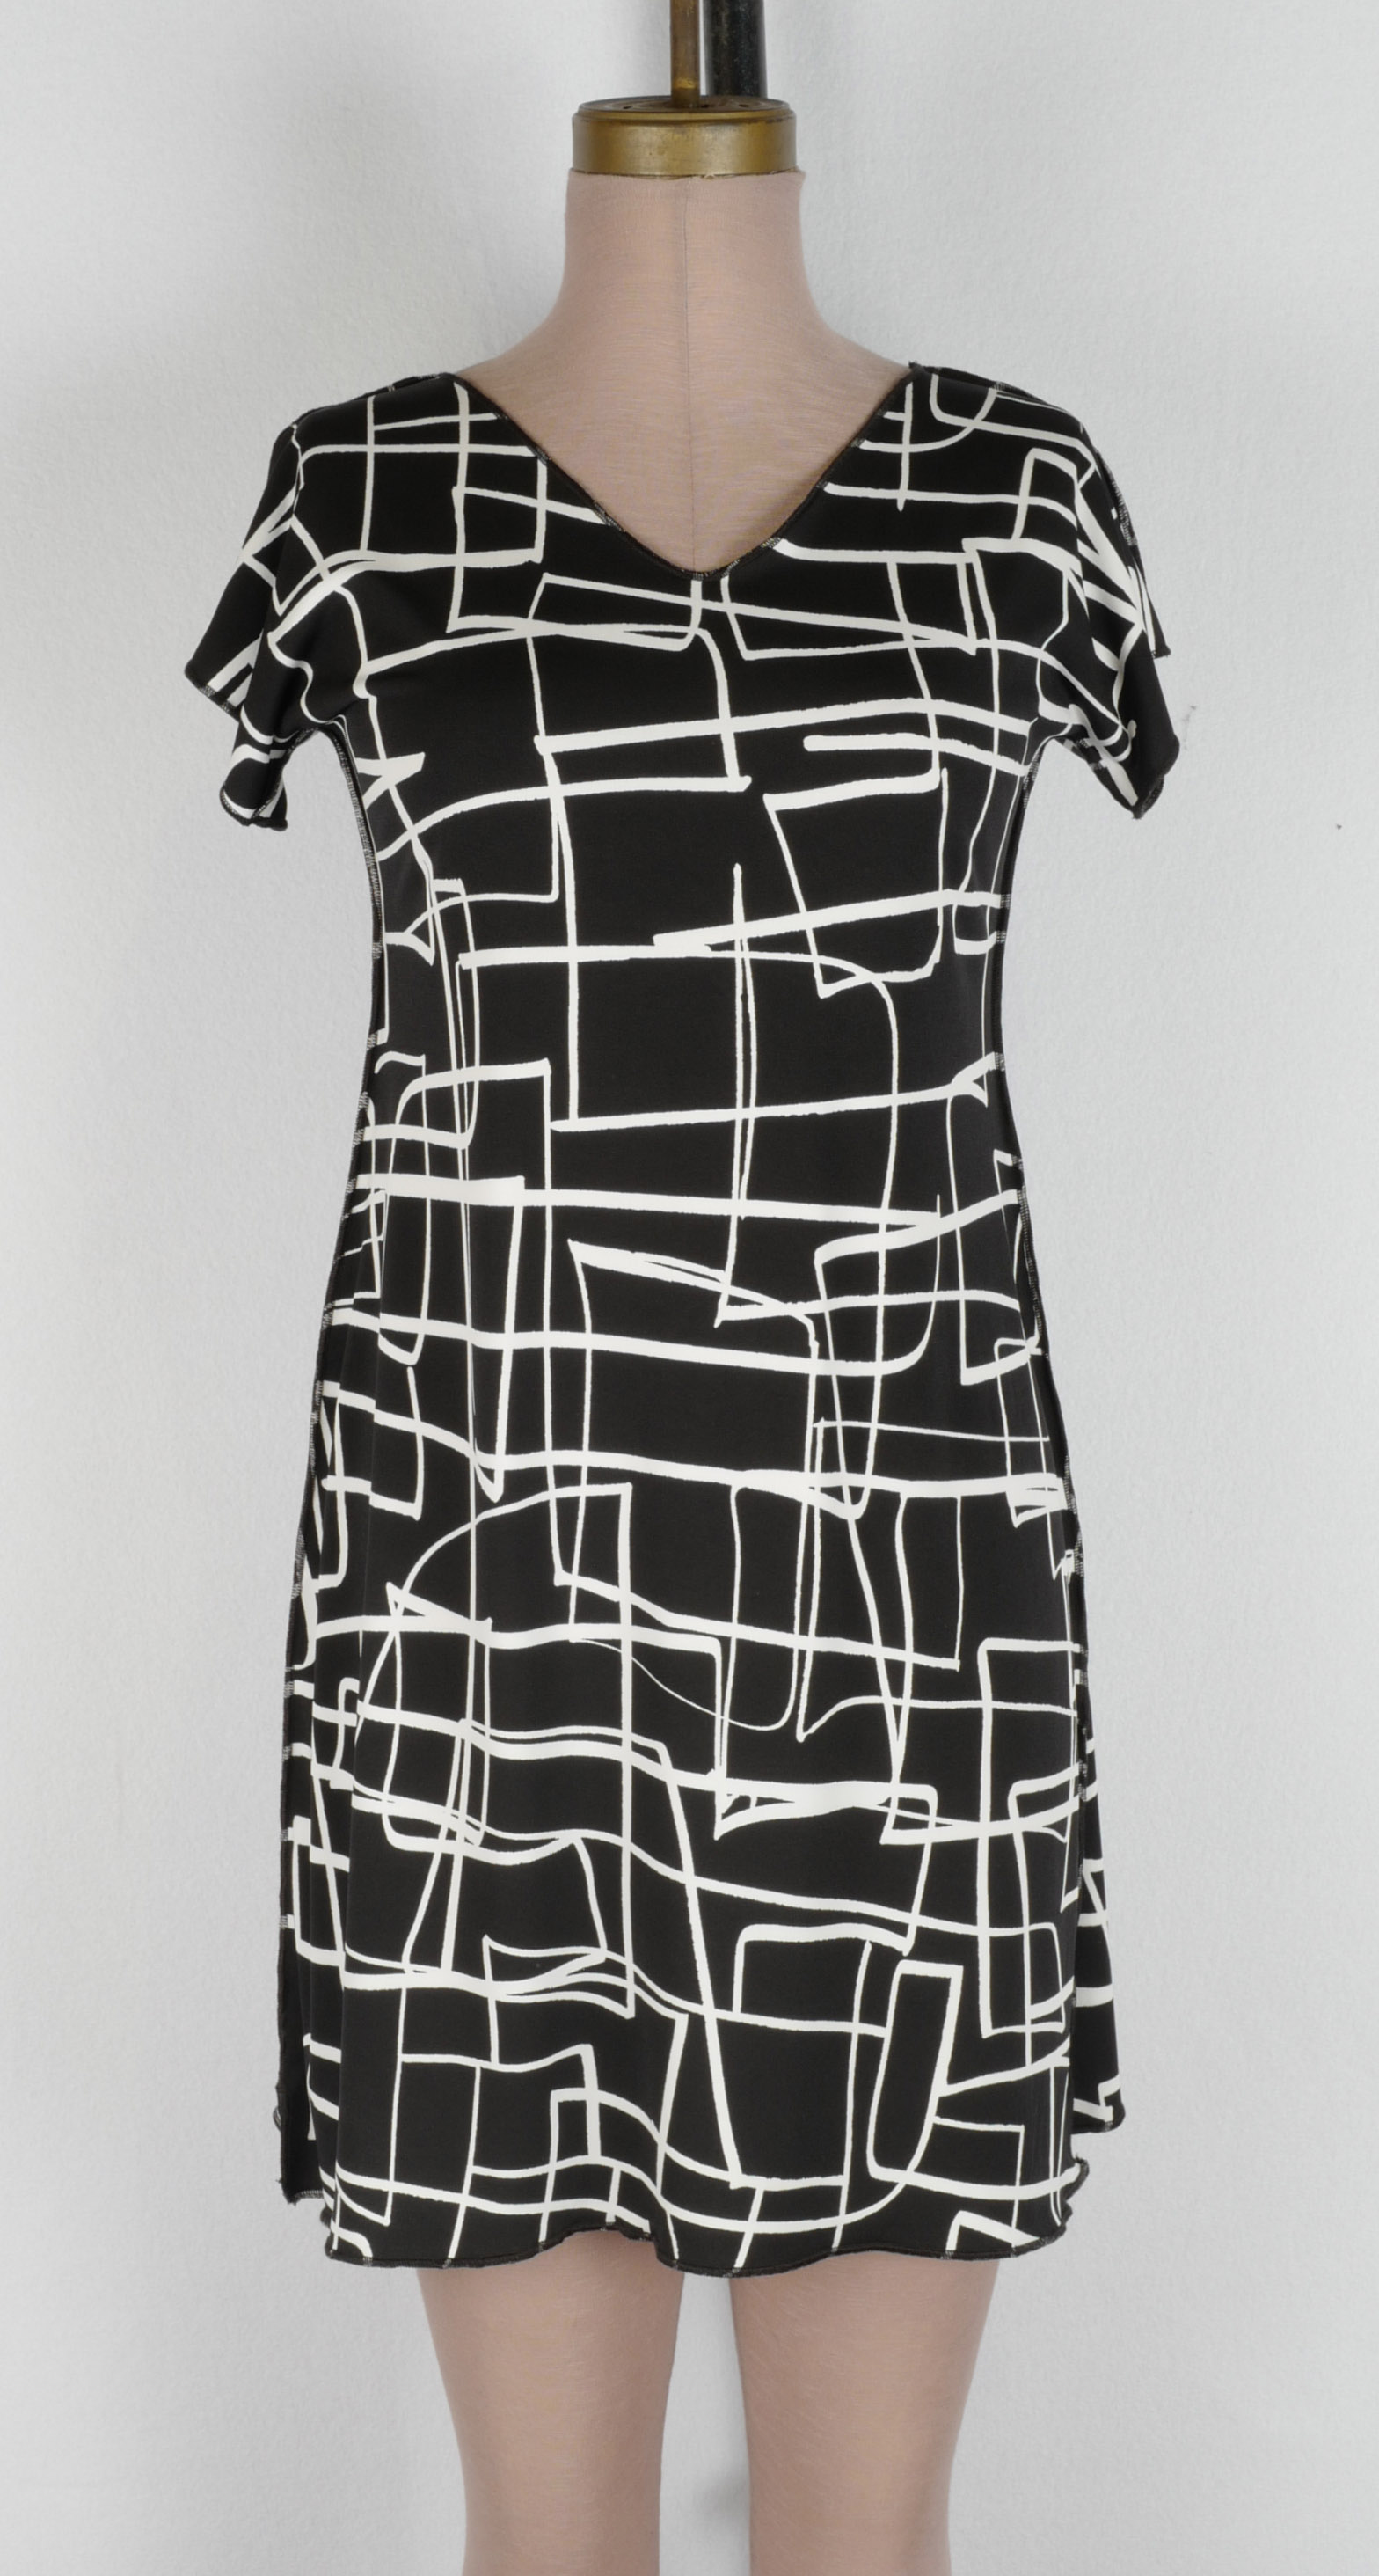 Black White Marker Square Cap T Dress 2019 cropped.jpg